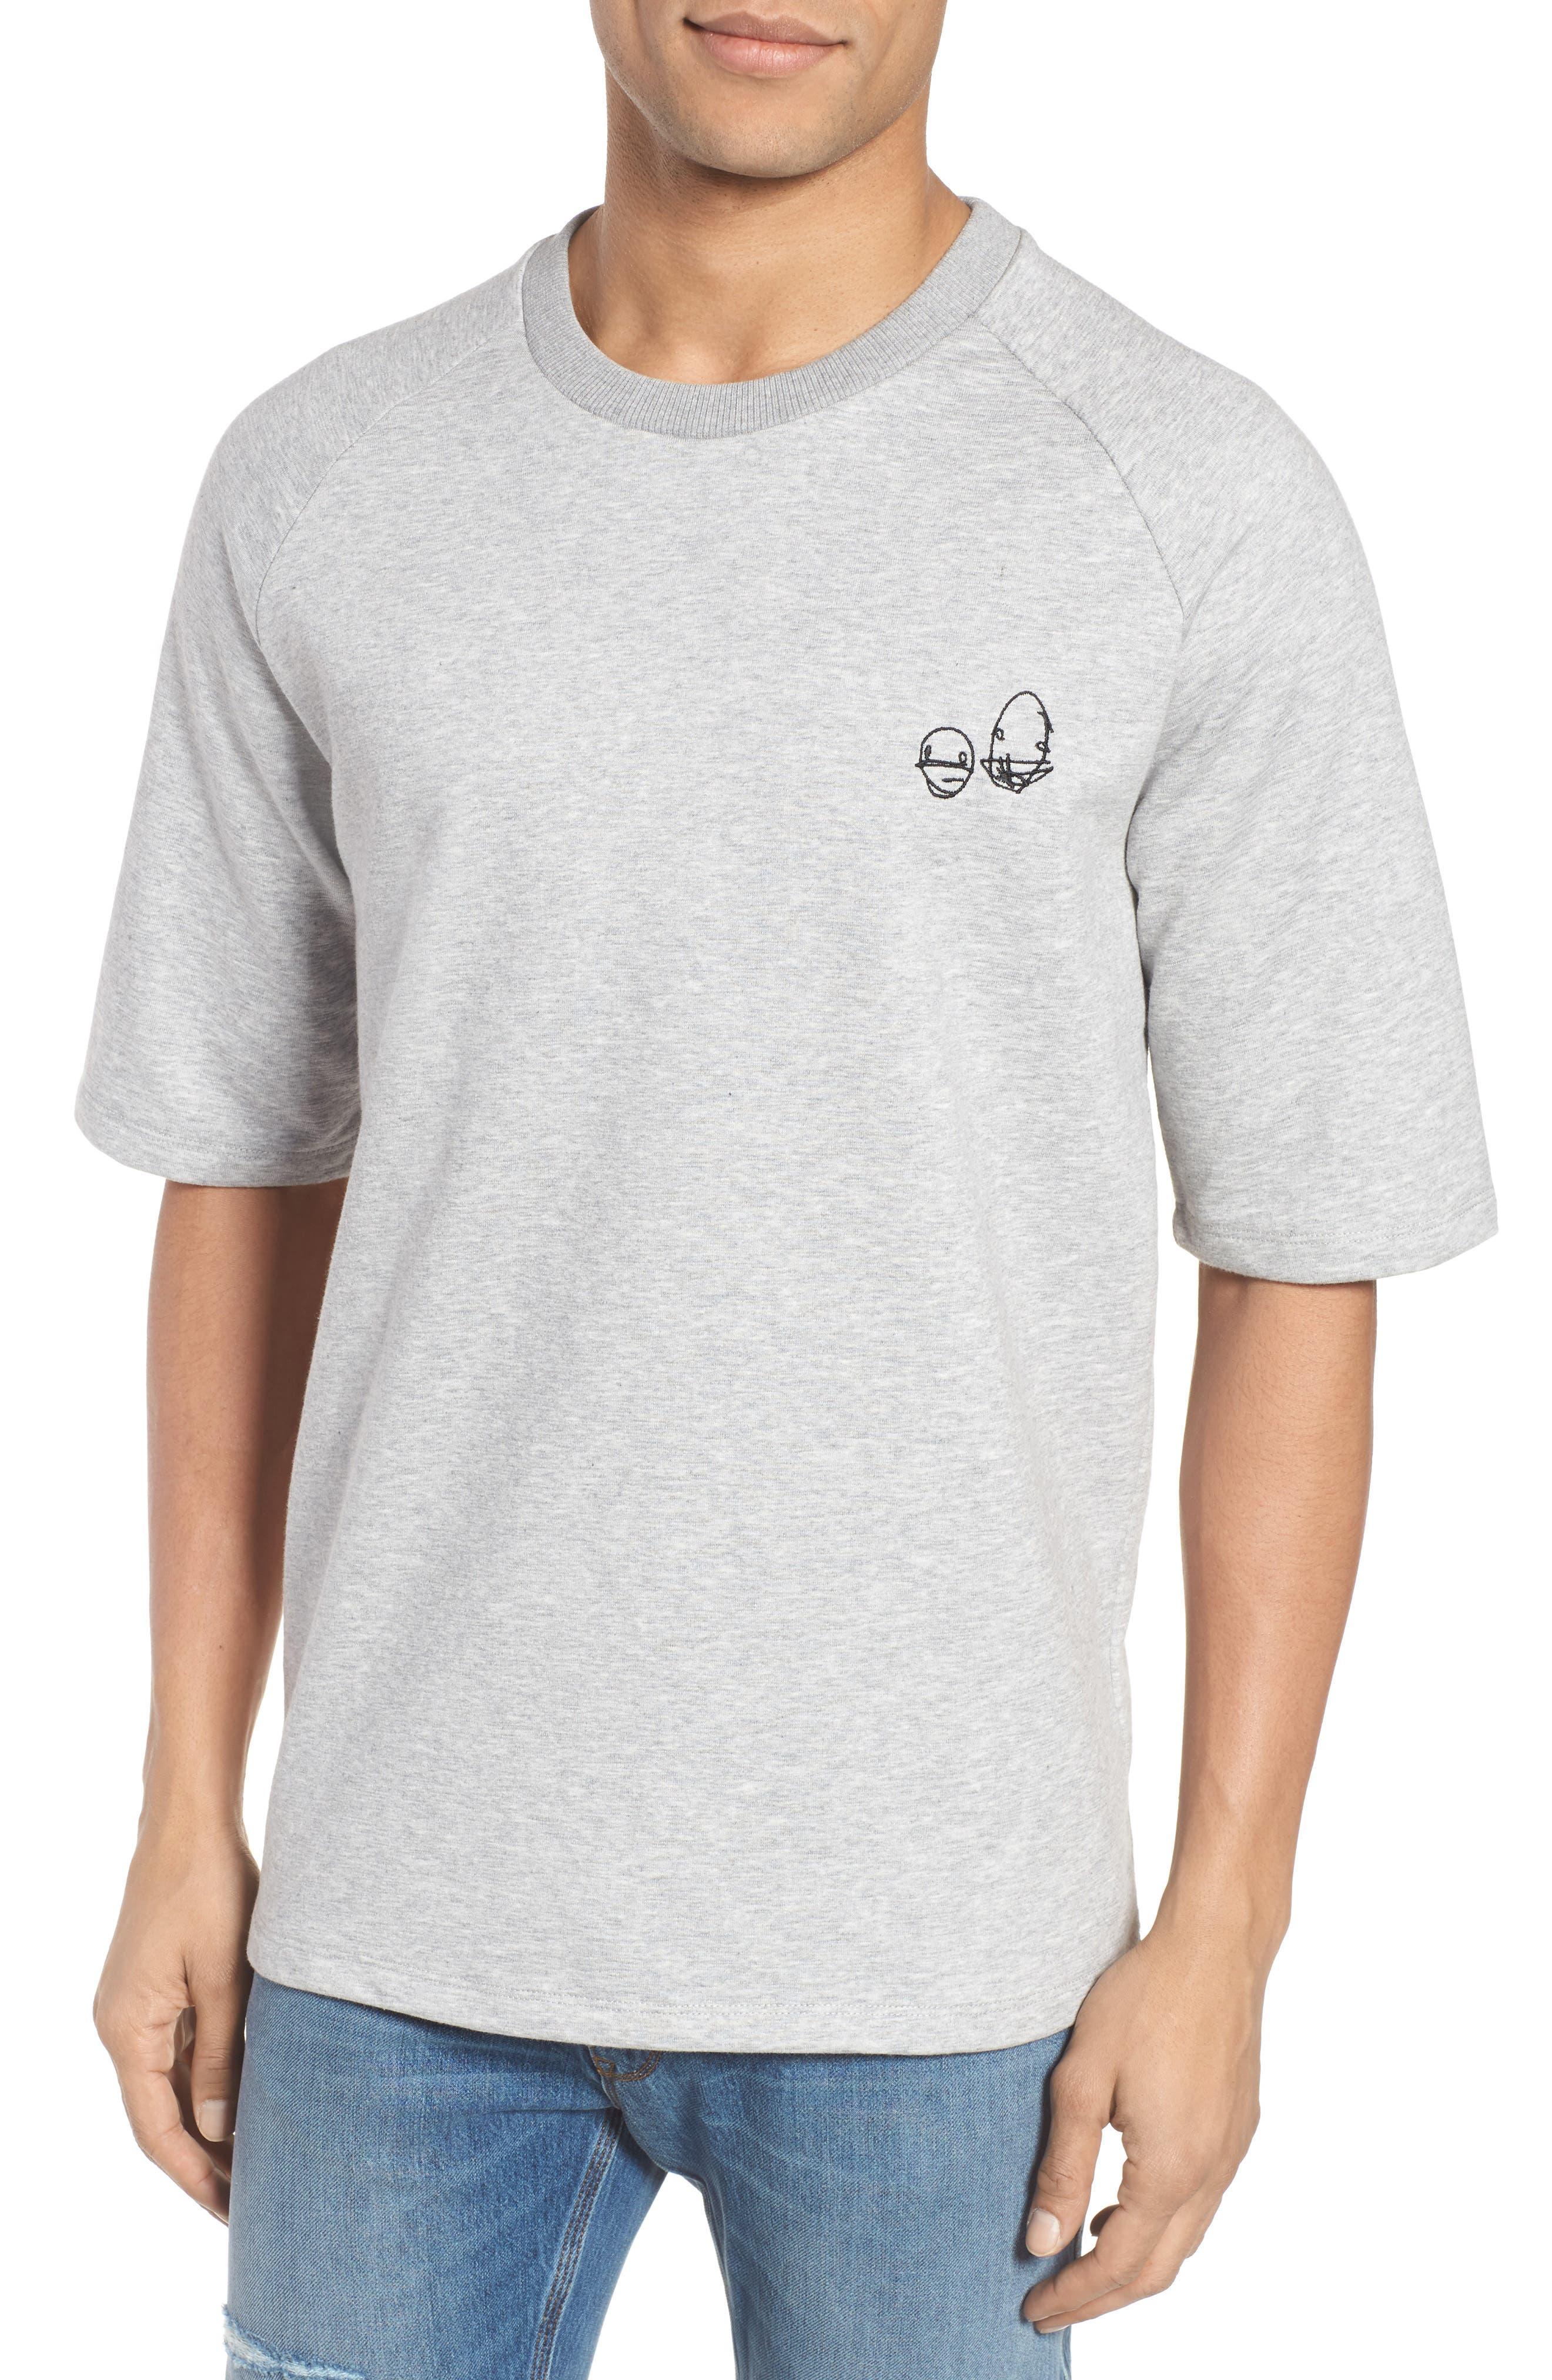 Deast Doodle Sweatshirt,                             Main thumbnail 1, color,                             Grey